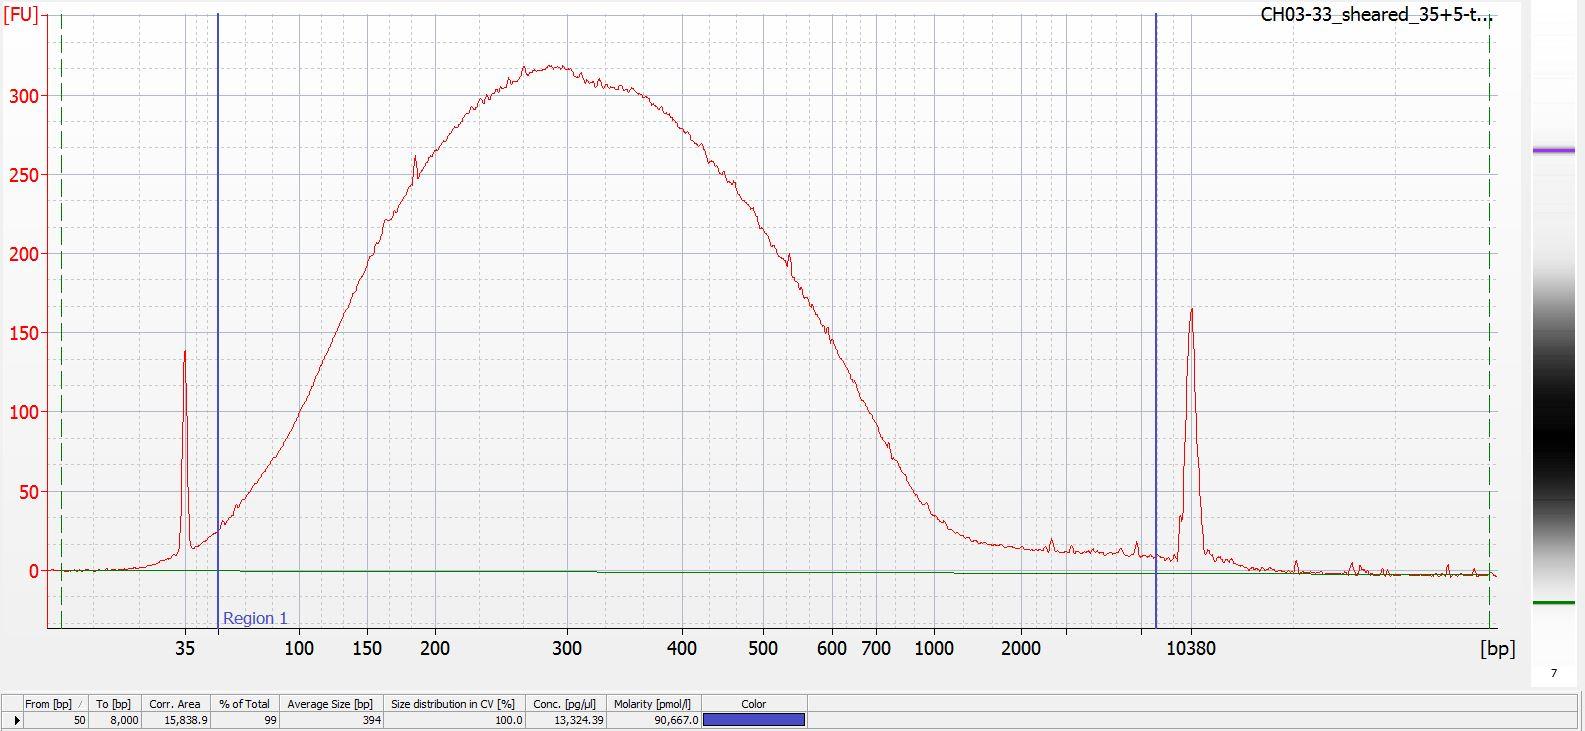 Sheared CH03-33 Bioanalyzer electropherogram